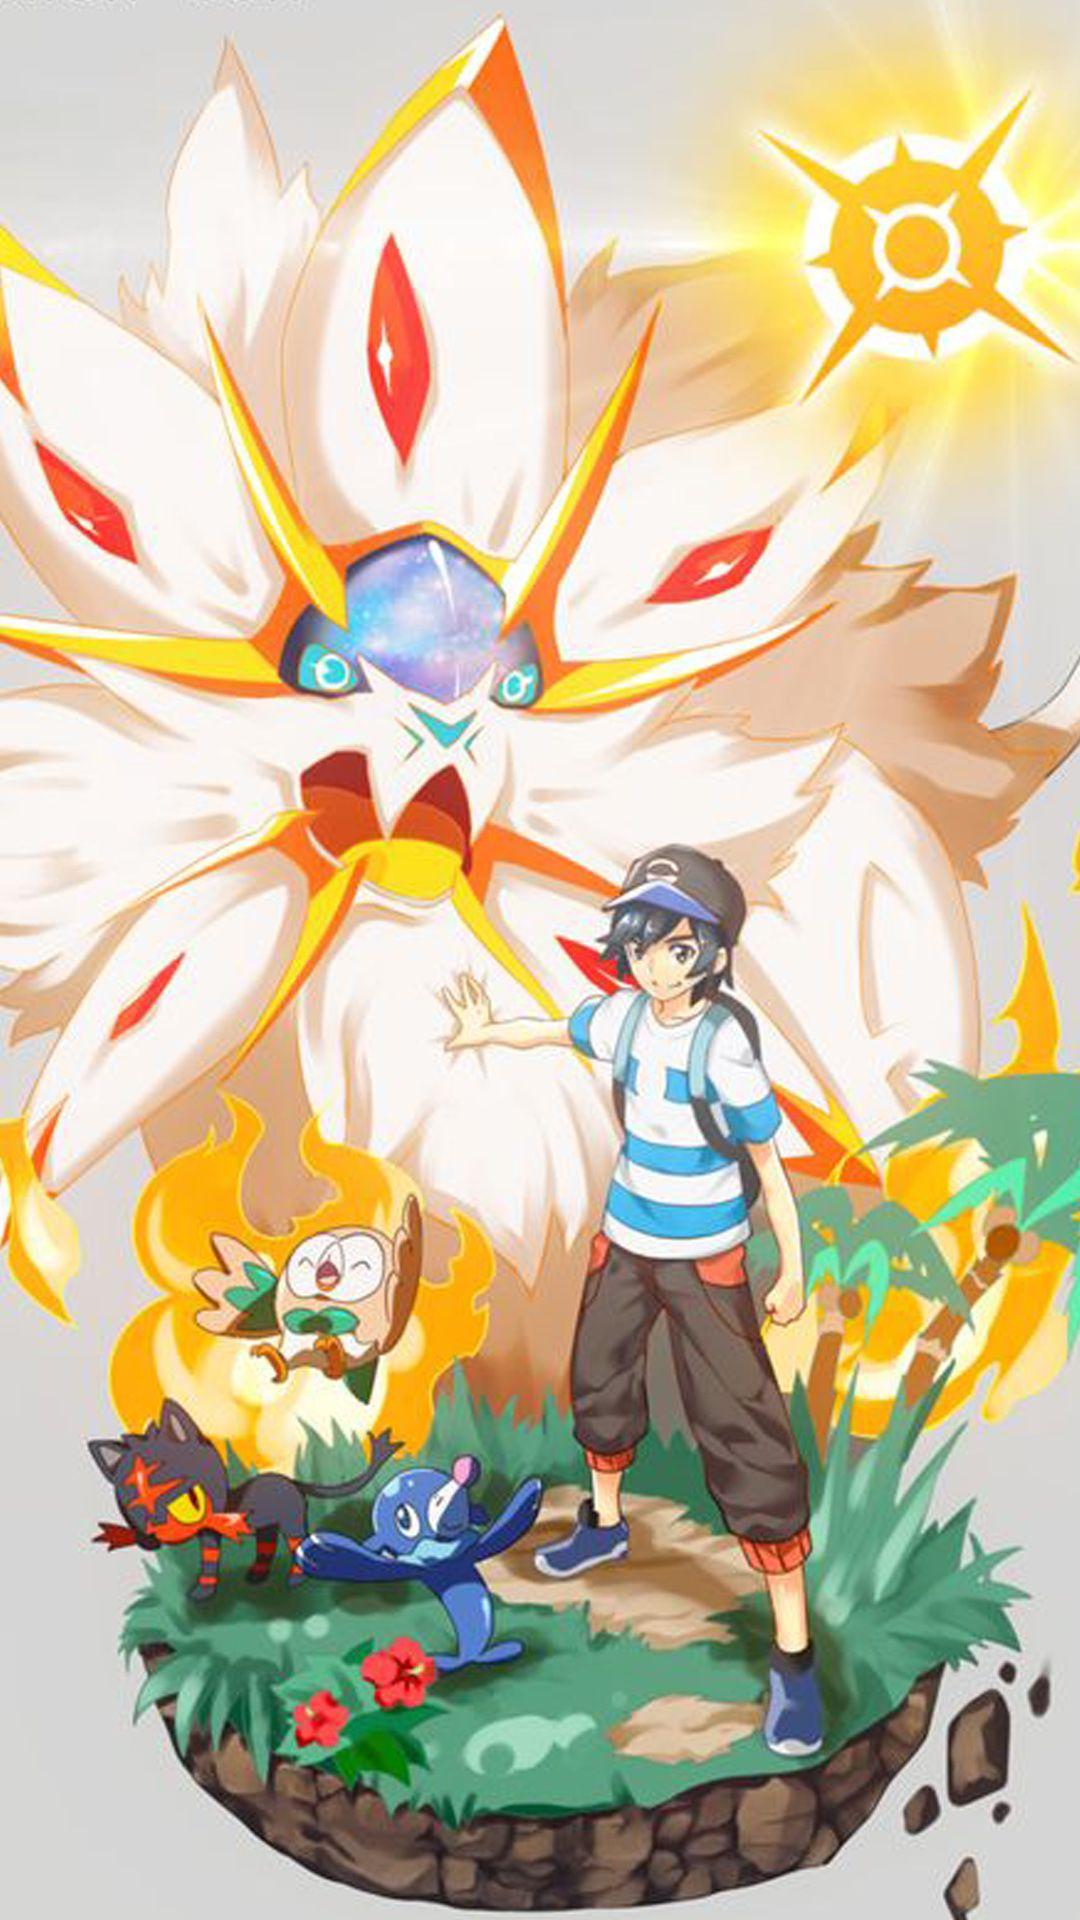 Pokemon Cool screensaver wallpaper